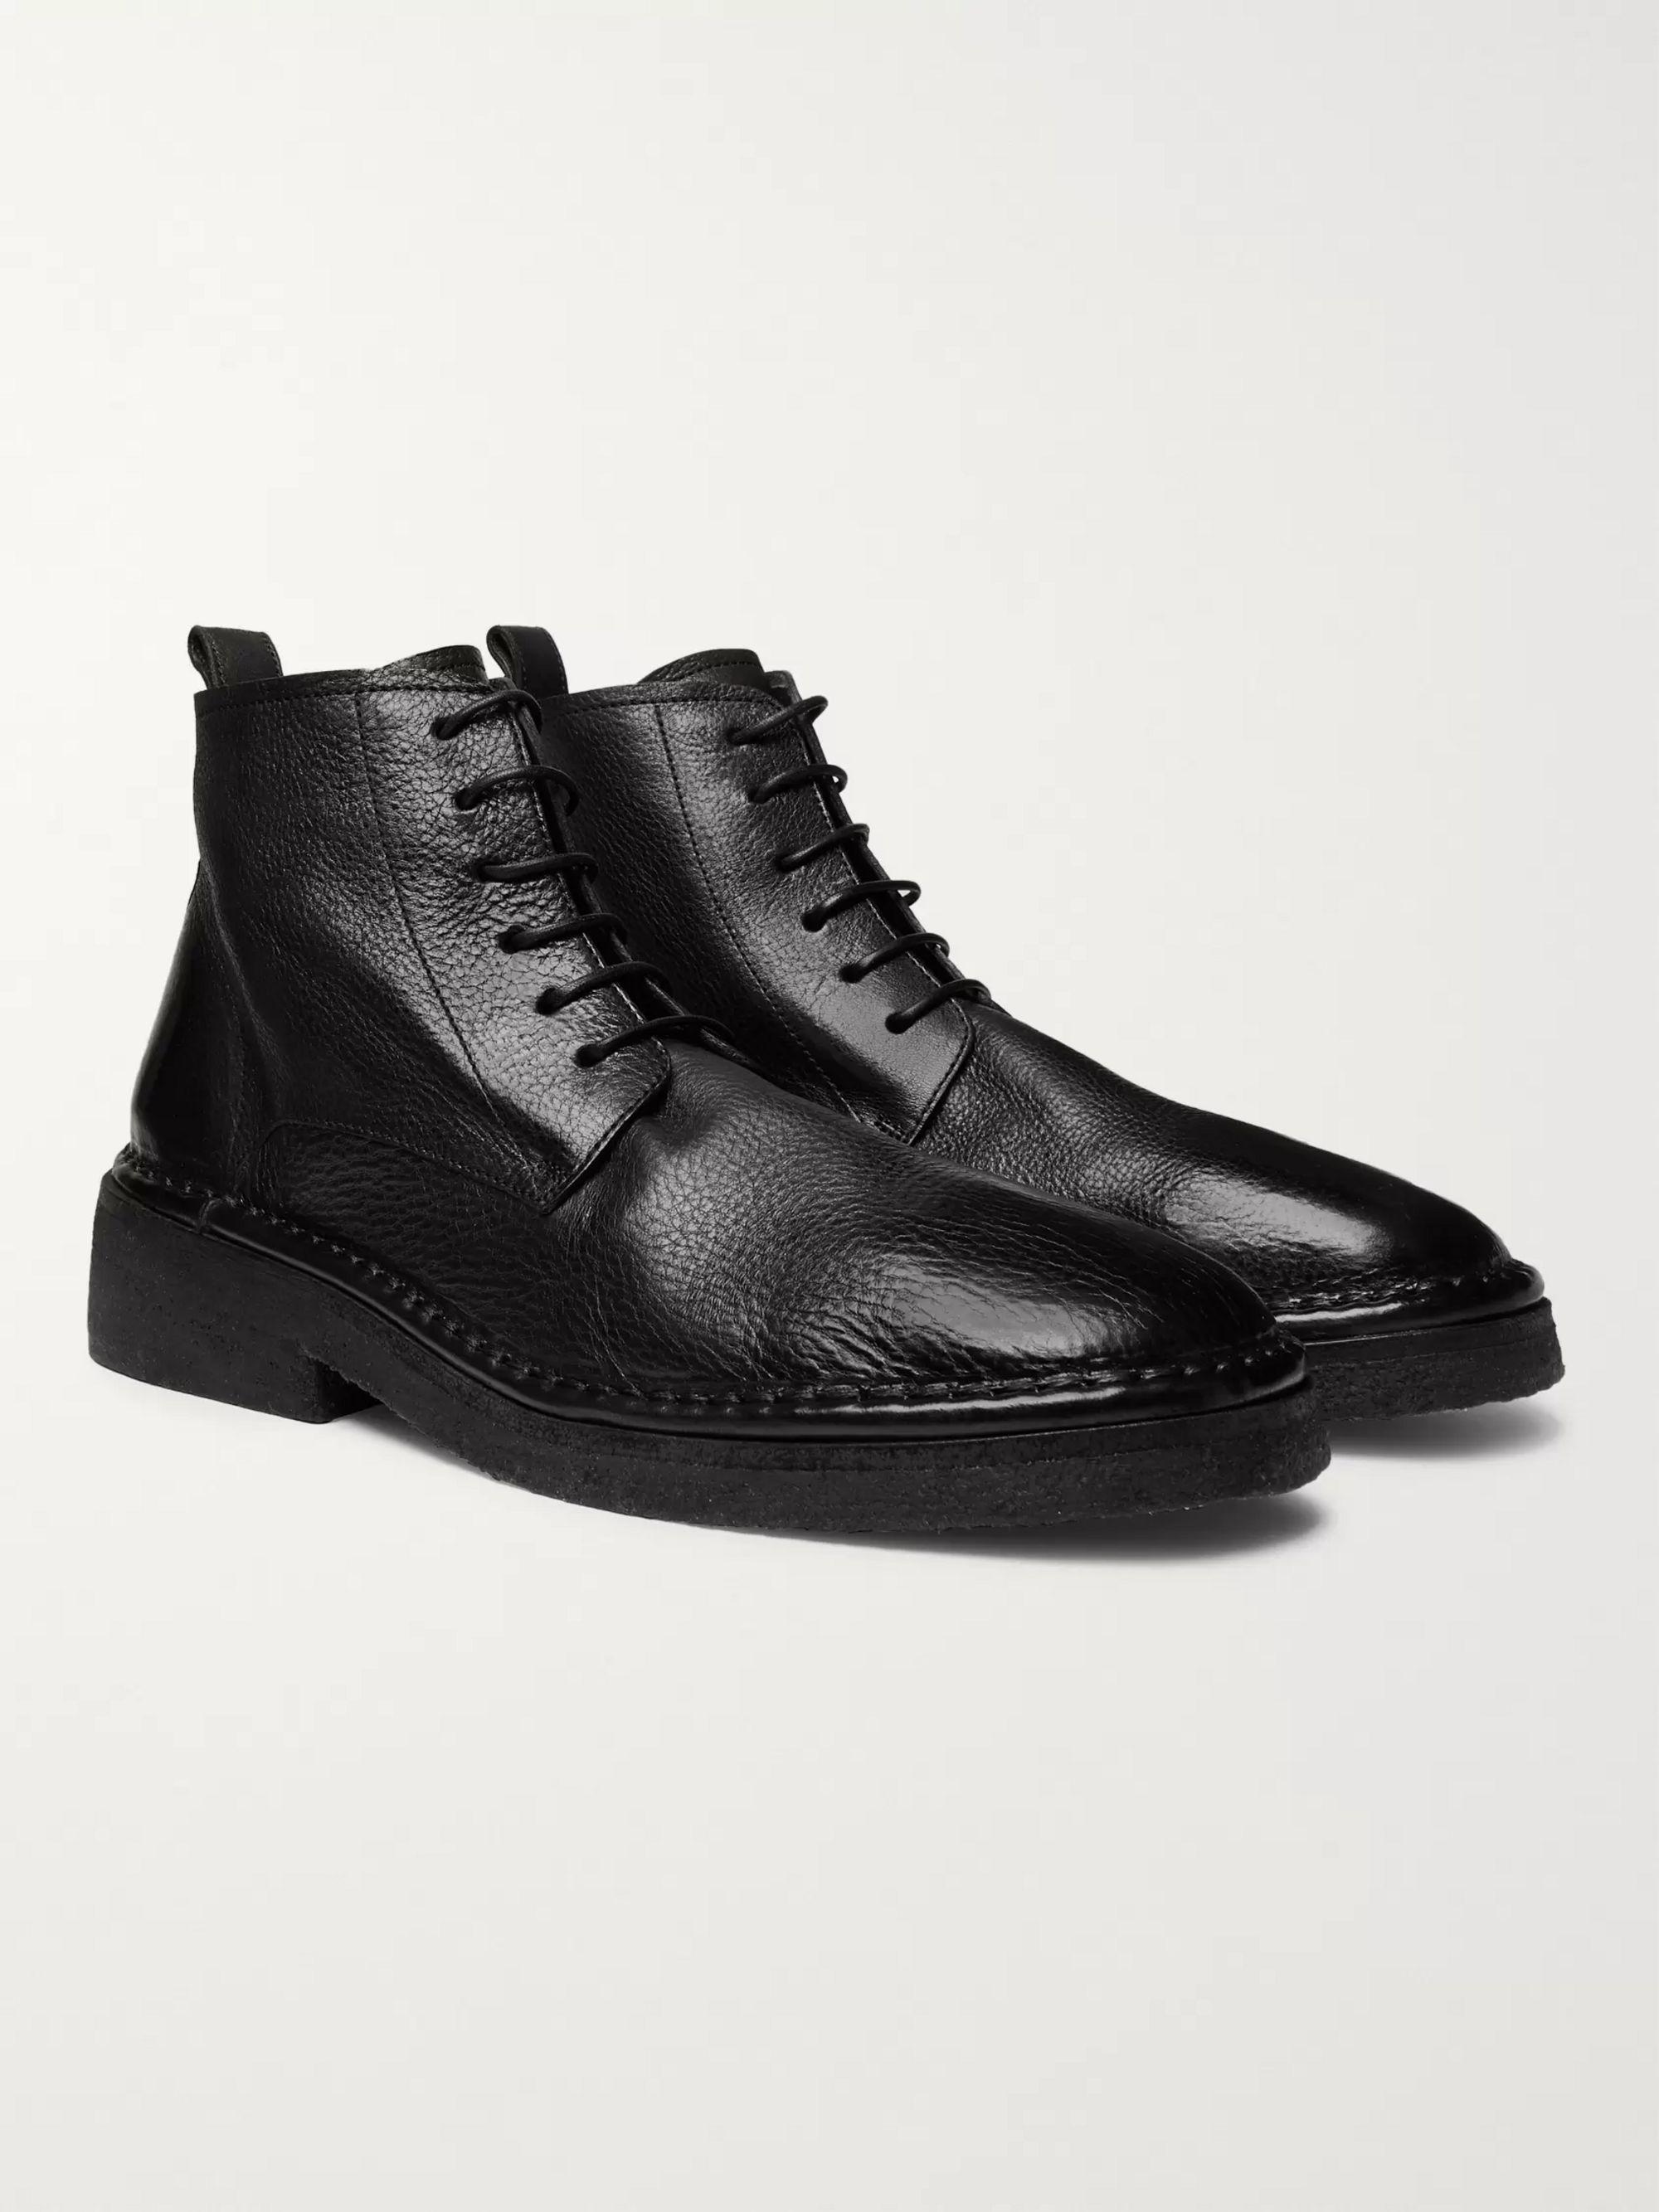 b313e366b26 Marsell Shoes   MR PORTER